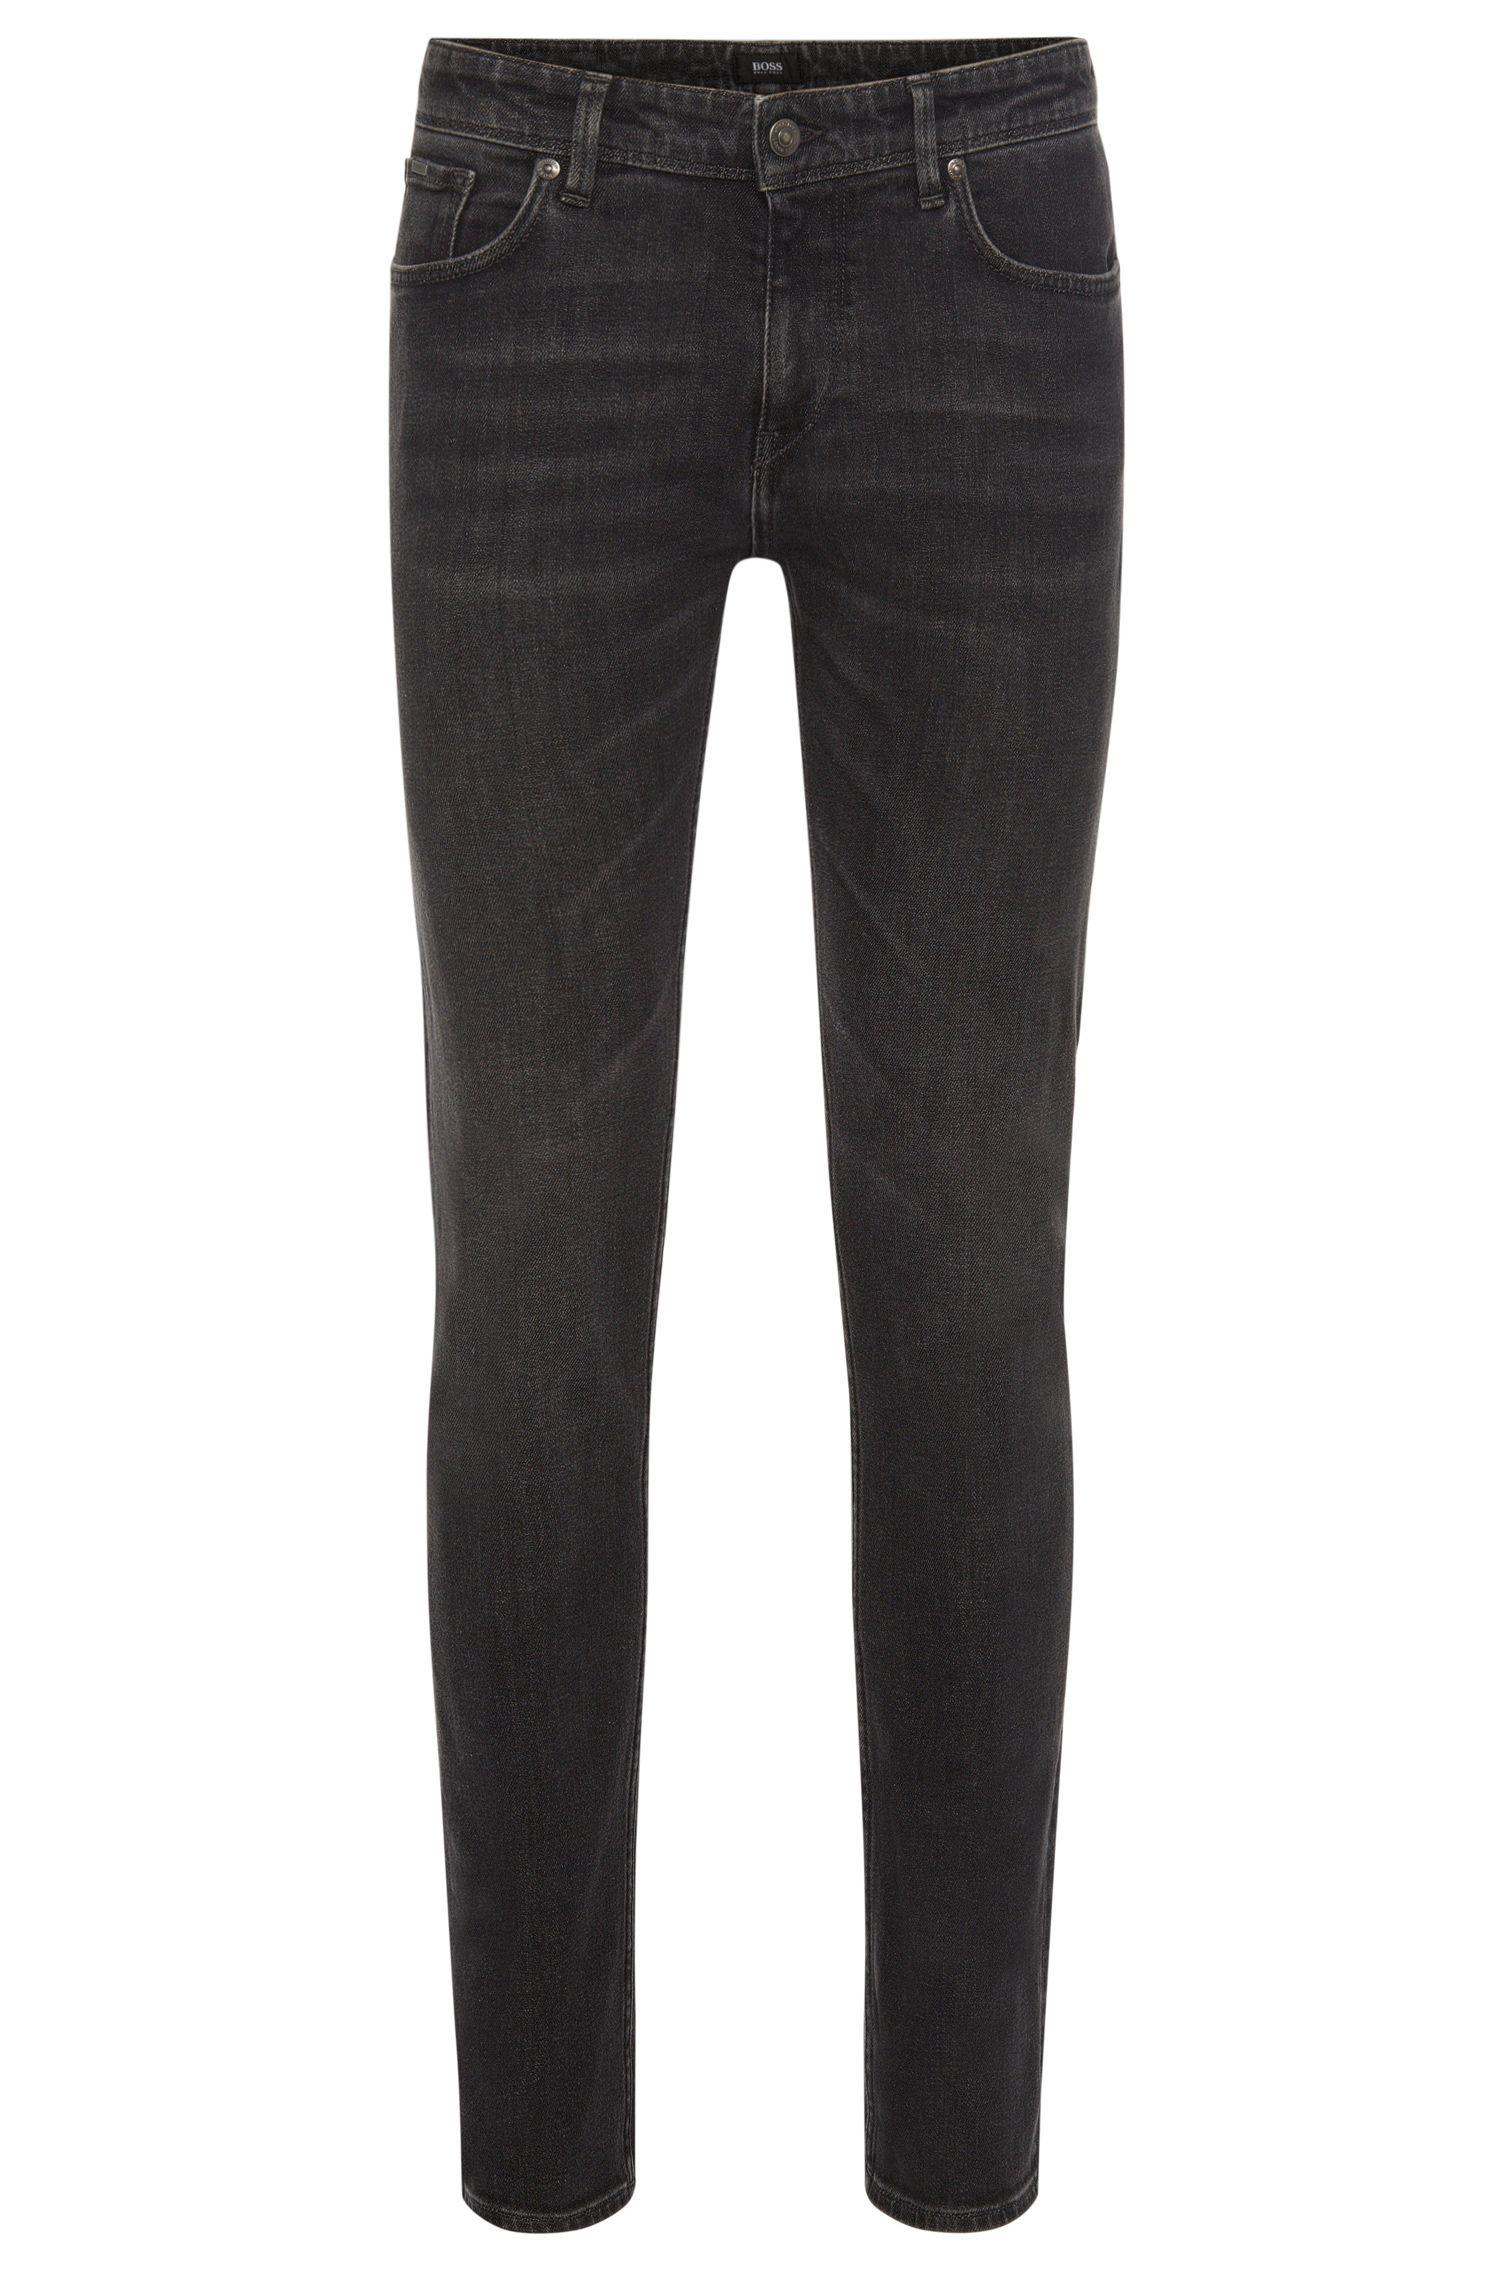 11.25 oz Stretch Cotton Jeans, Extra Slim Fit | Charleston